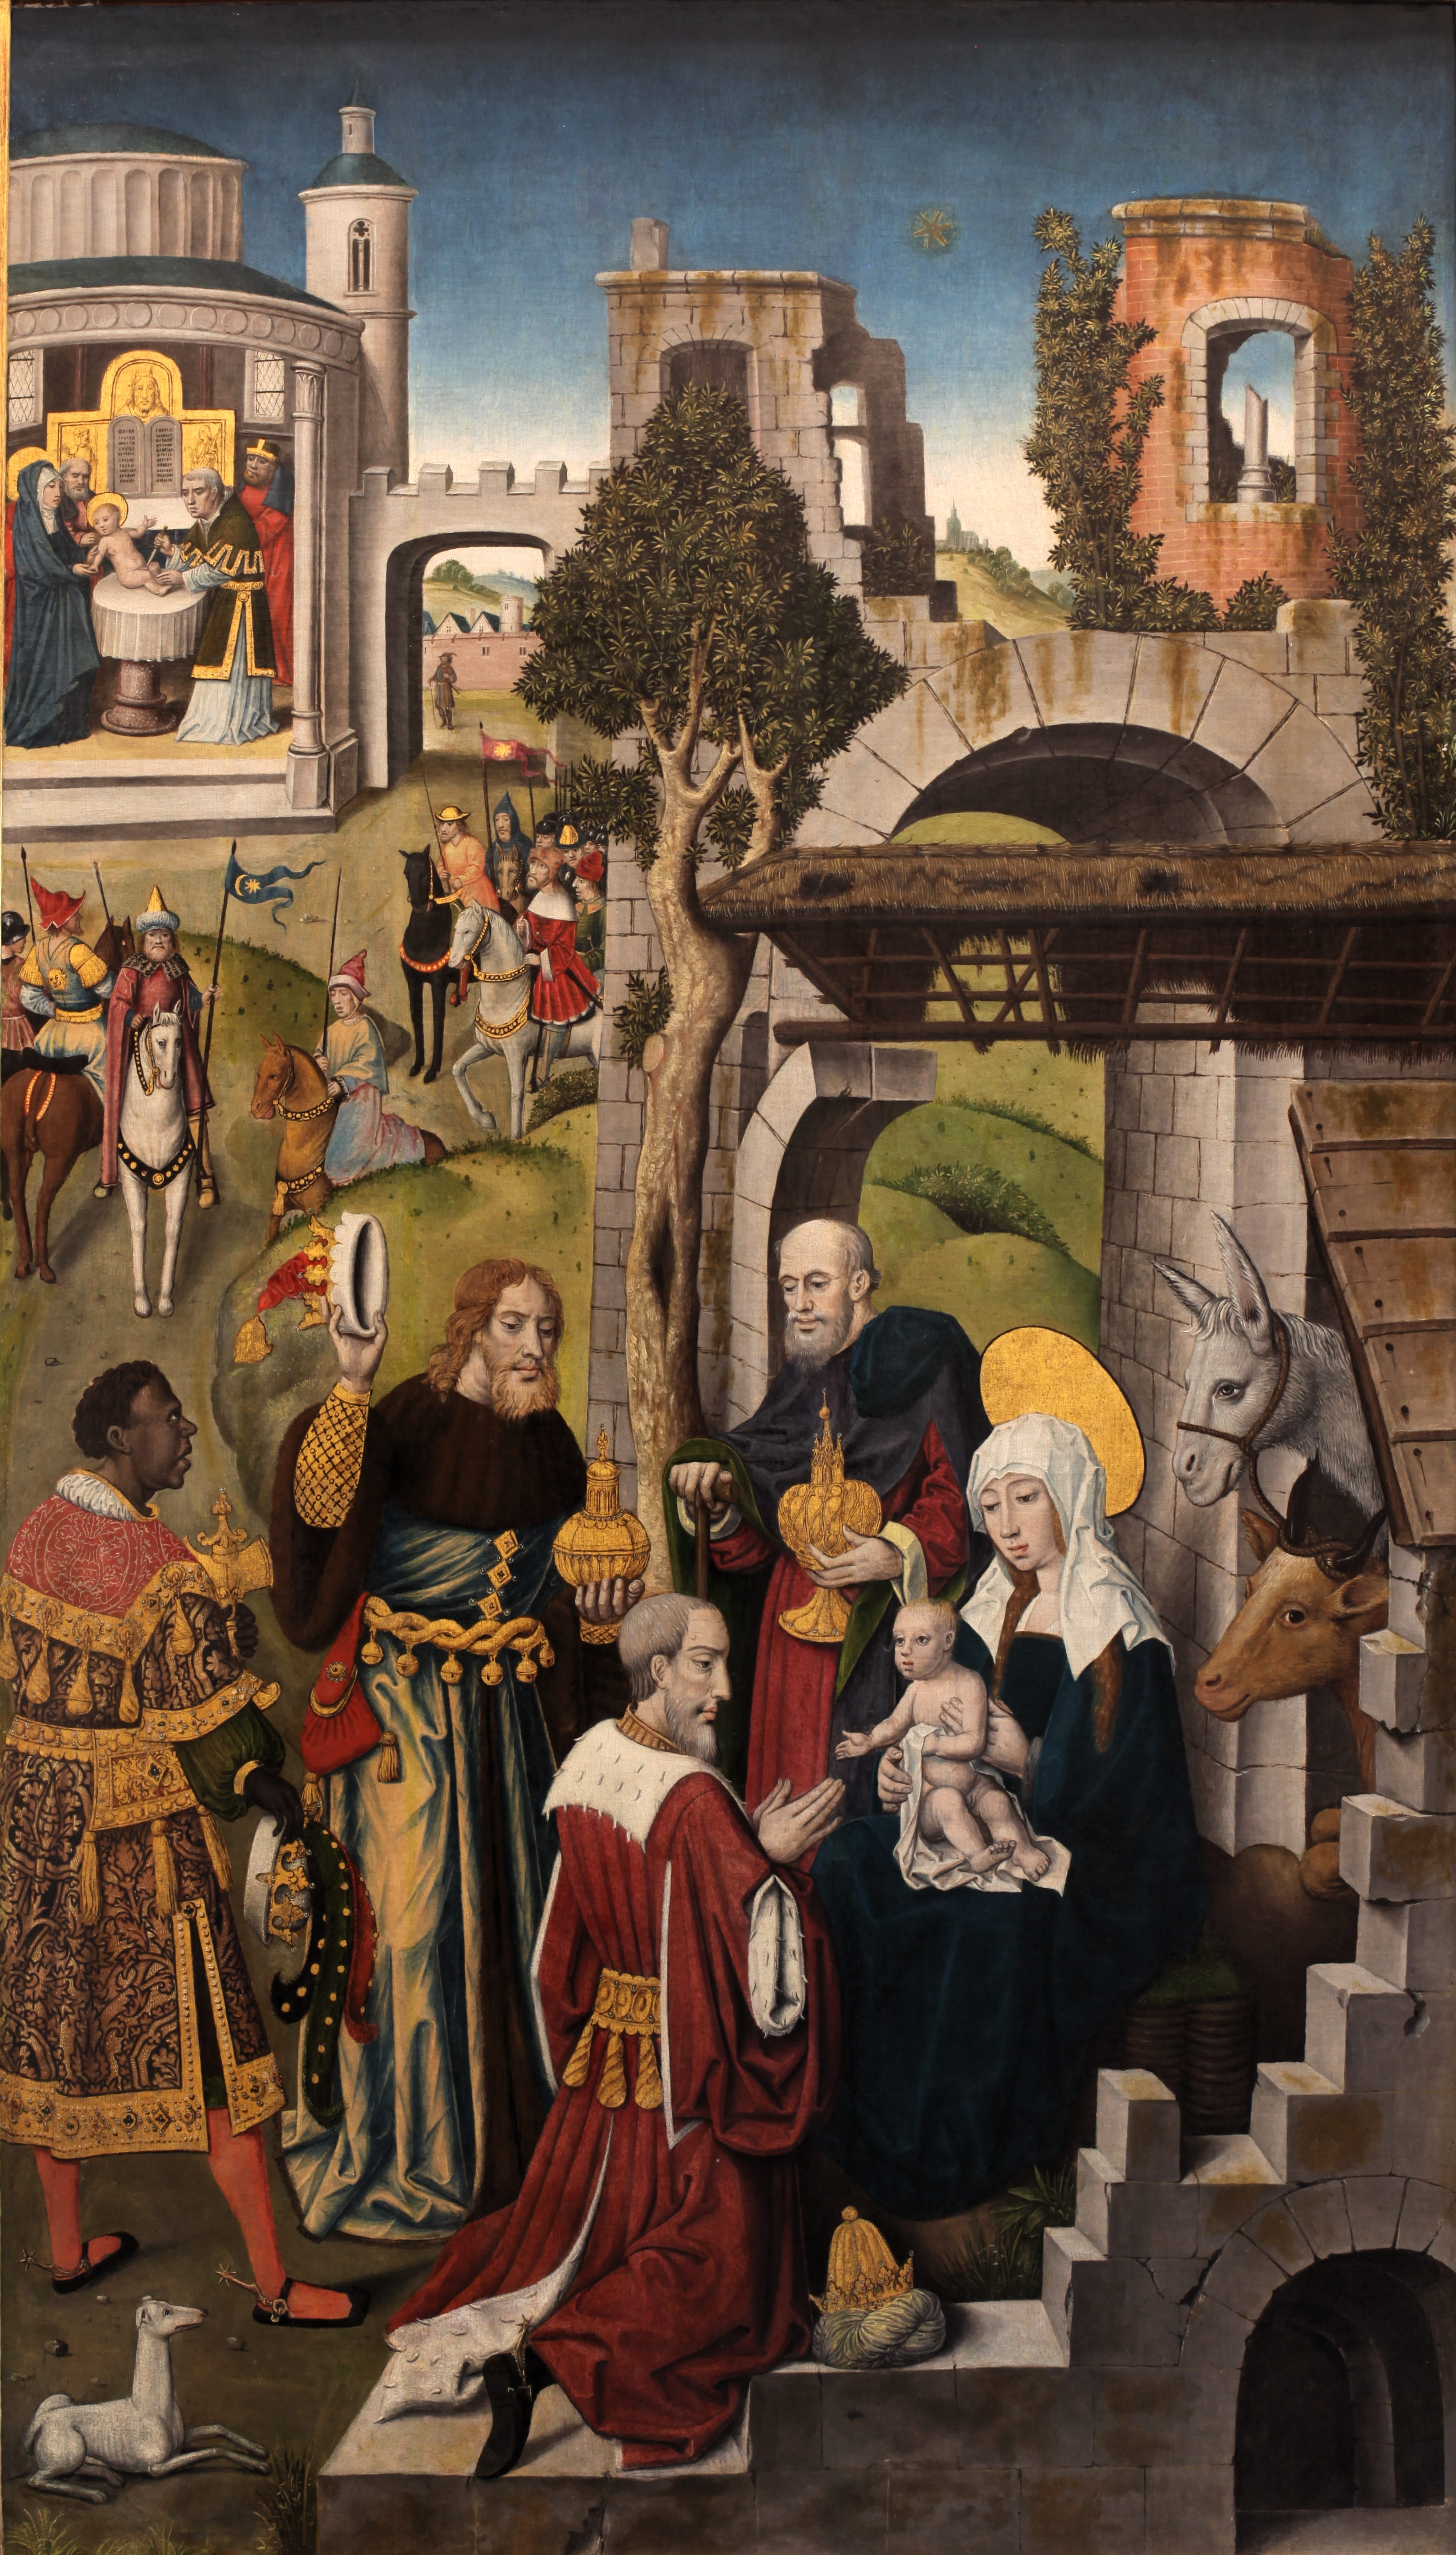 https://upload.wikimedia.org/wikipedia/commons/e/ef/Adoration_of_Wise_Kings-Master_of_monogram_AH-MBA_Lyon_H648a-IMG_0244.jpg